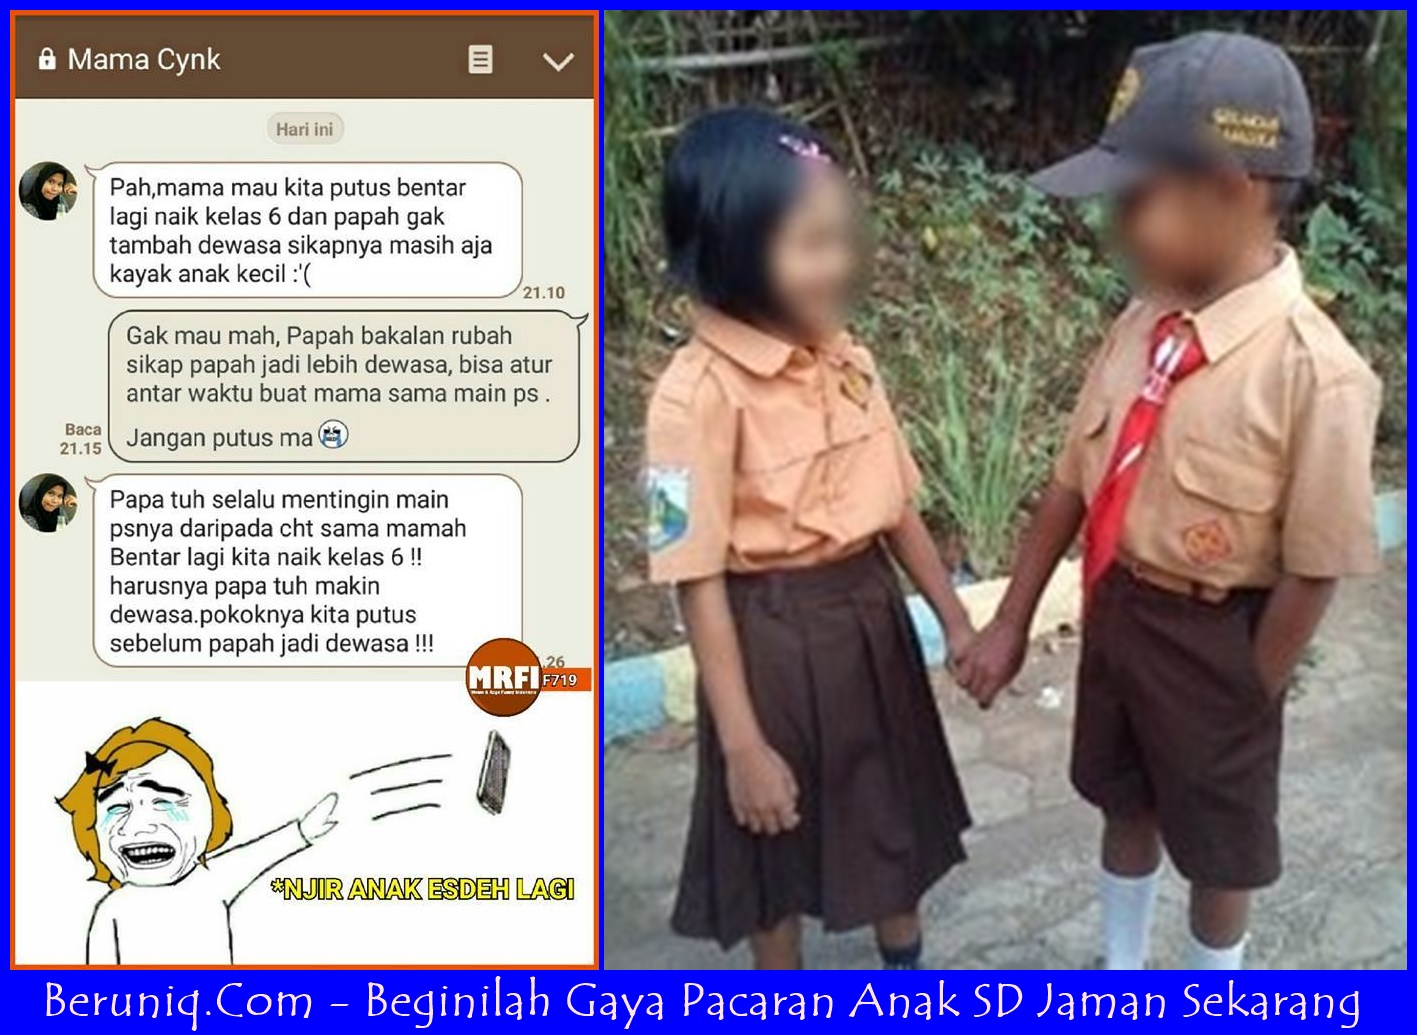 Gambar Chat Pacar Yg Lucu  Aliansi kartun